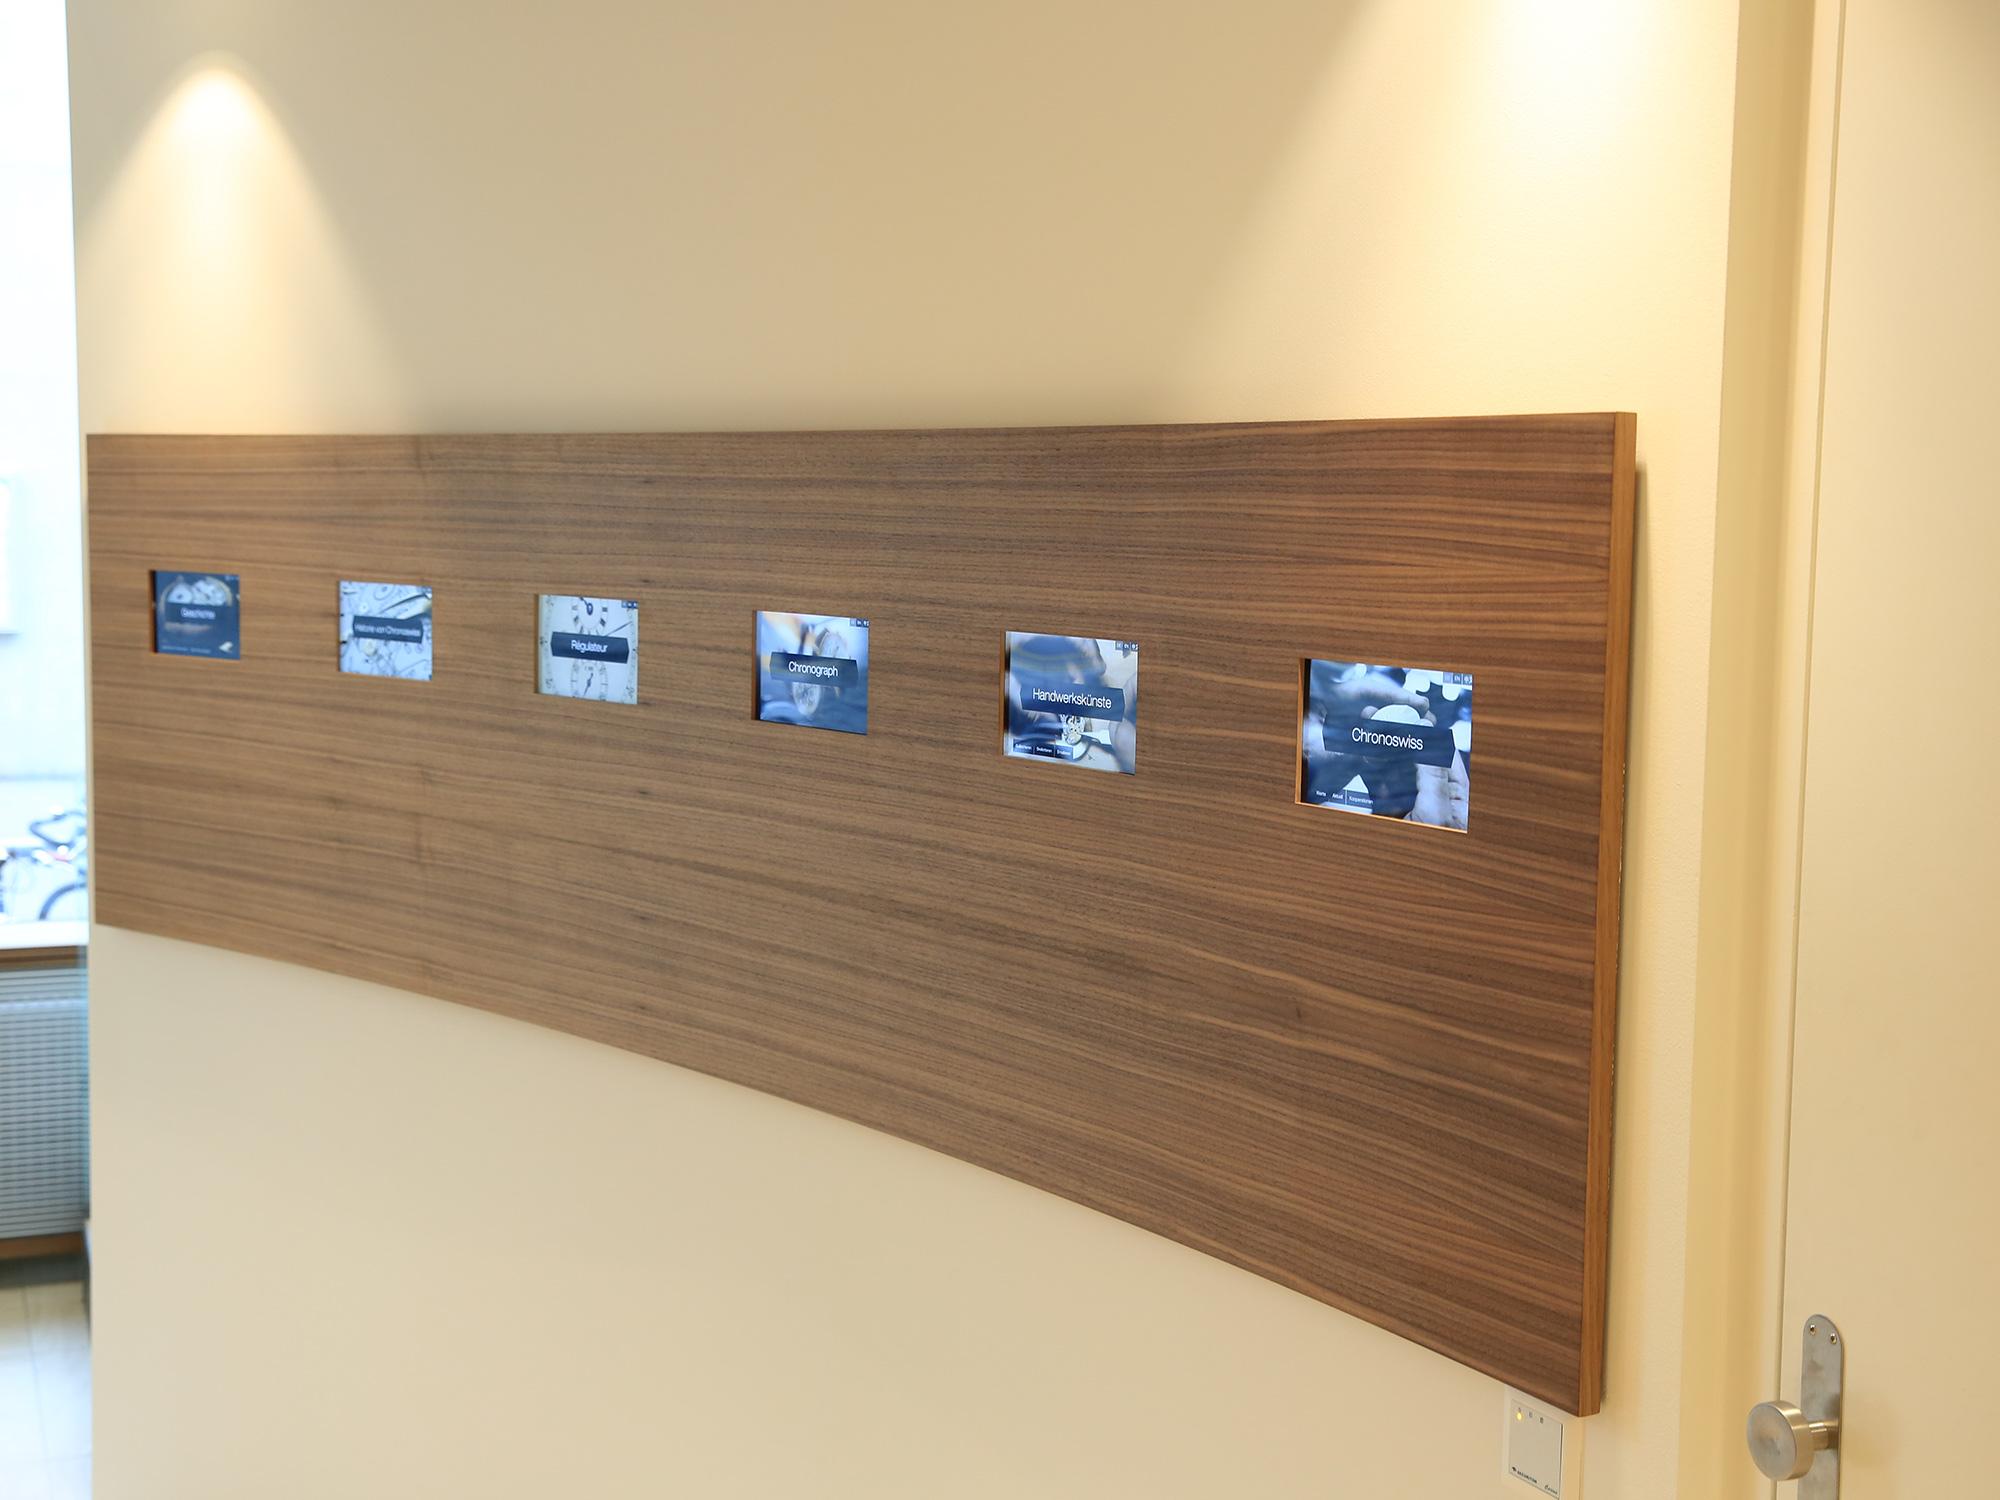 3_interaktive-history-wall